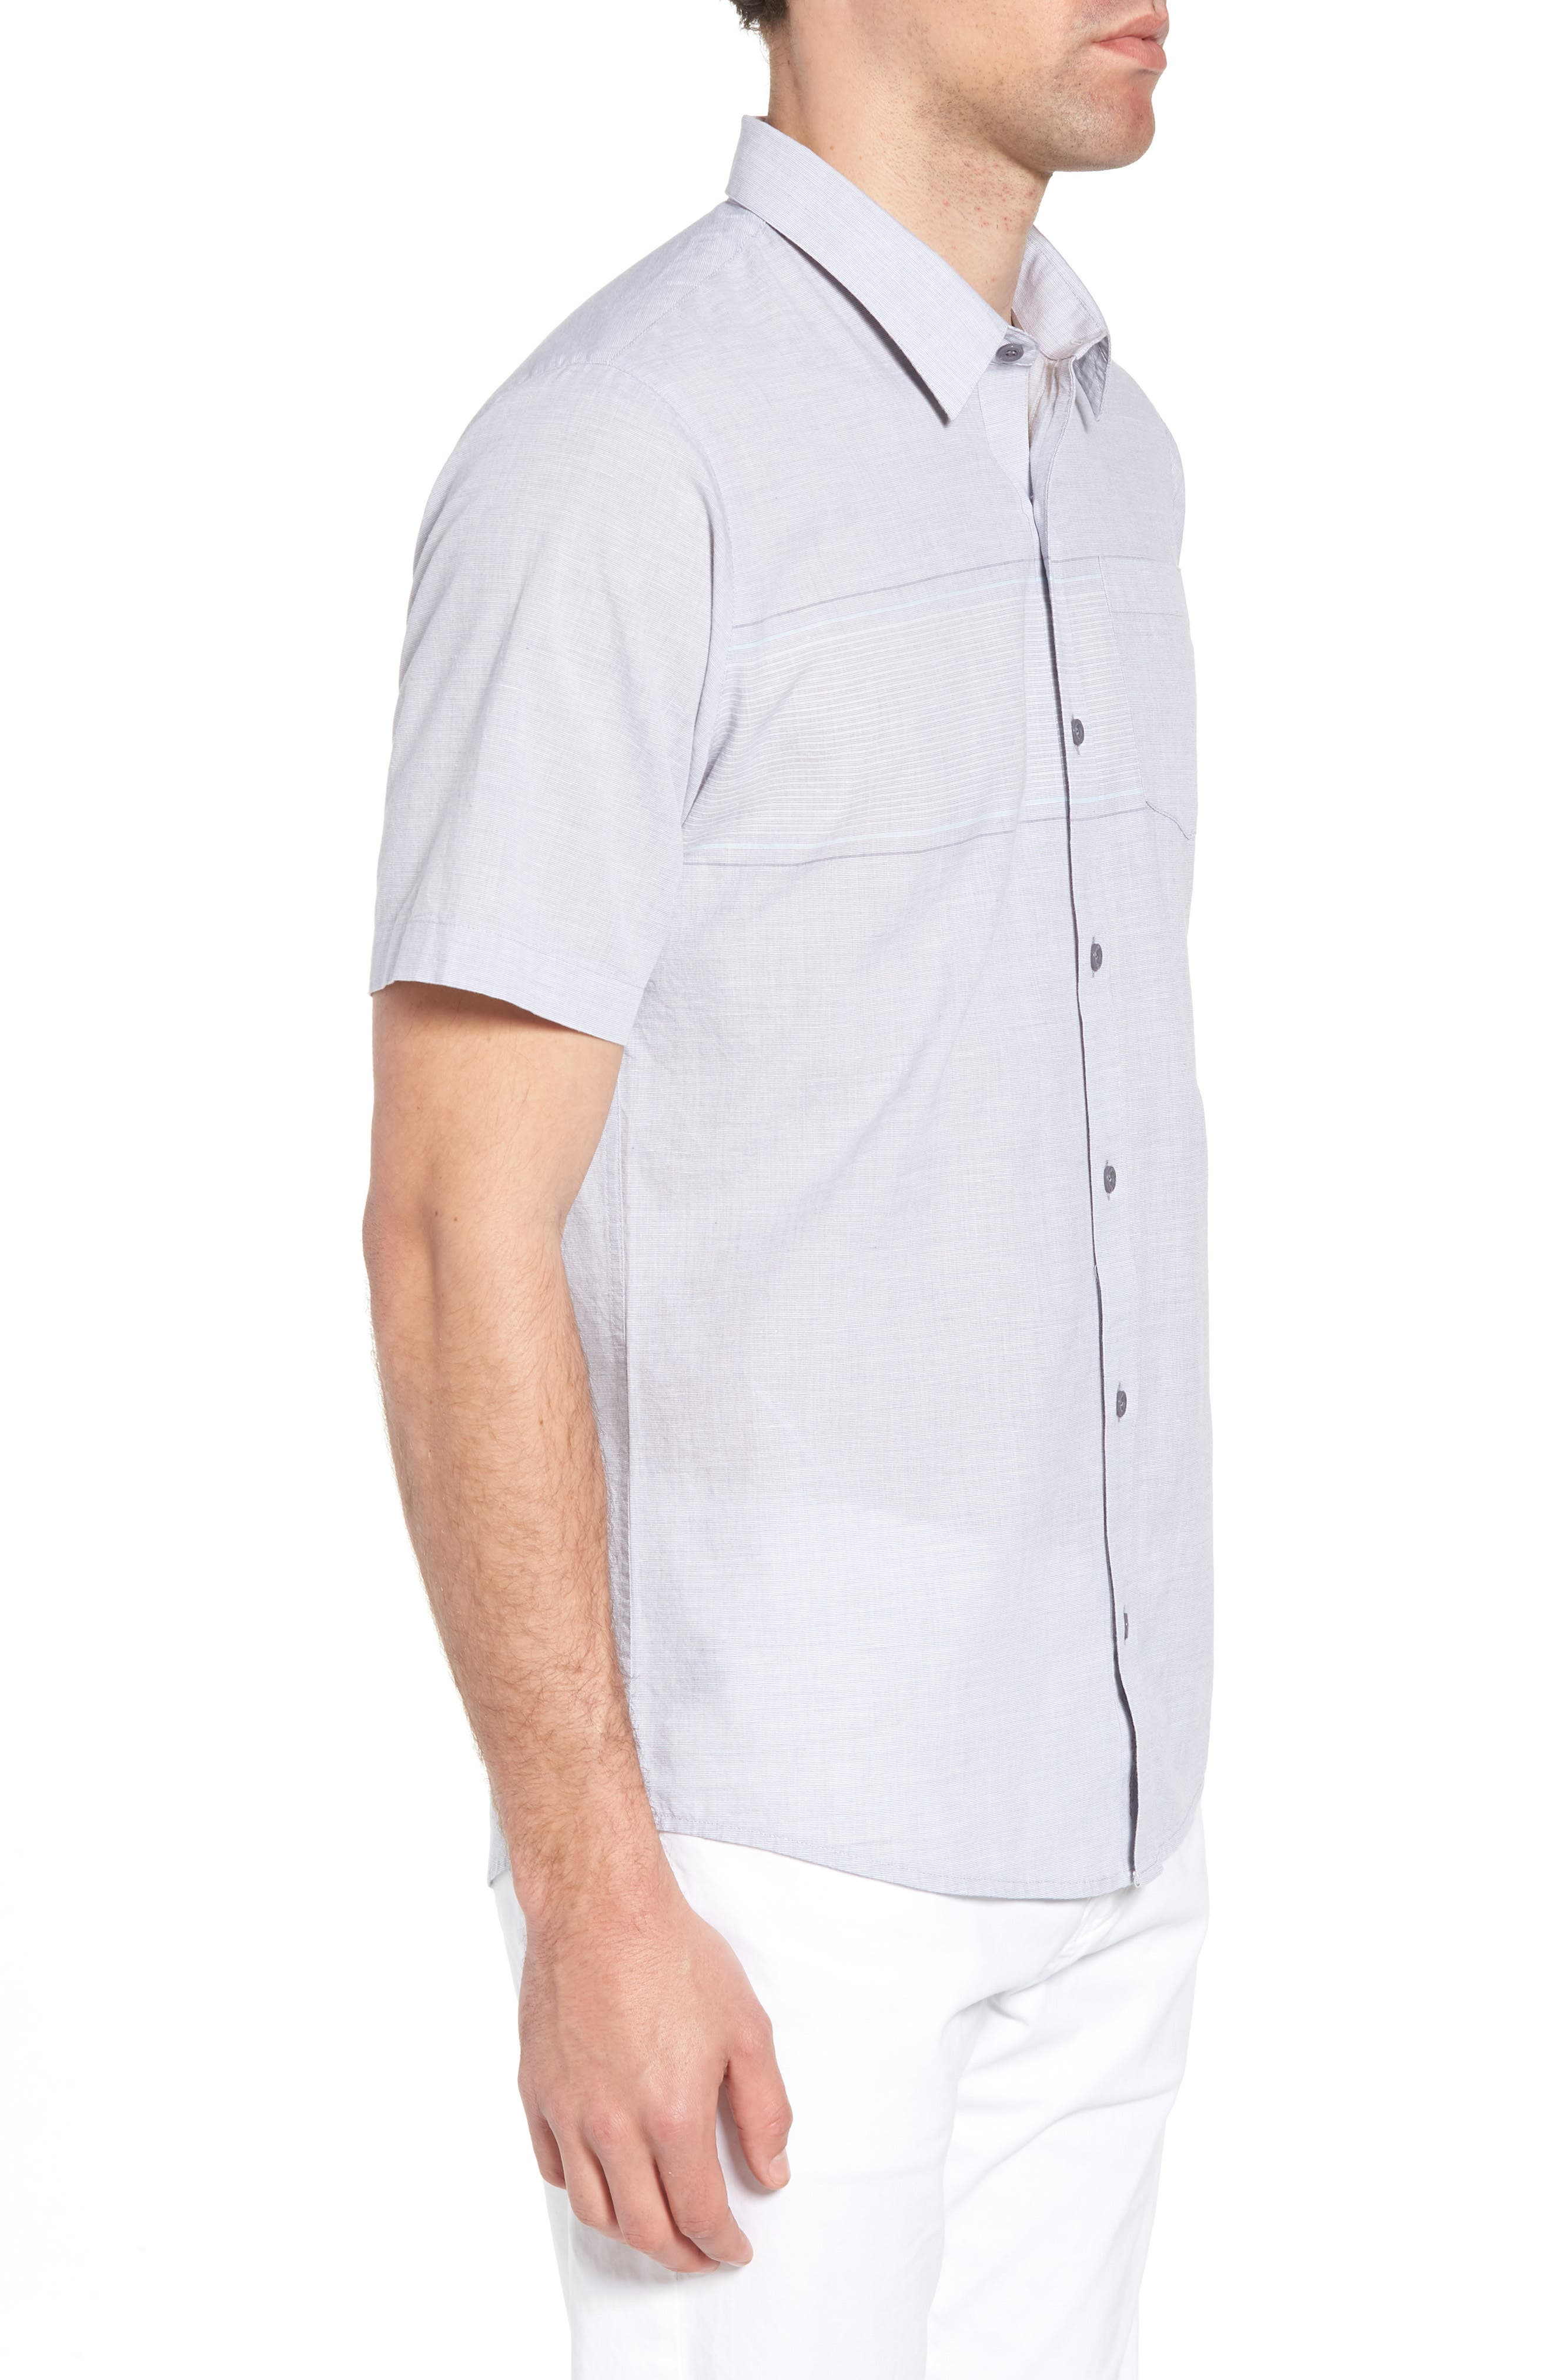 Oscar Regular Fit Sport Shirt,                             Alternate thumbnail 3, color,                             HEATHER GRASILLE